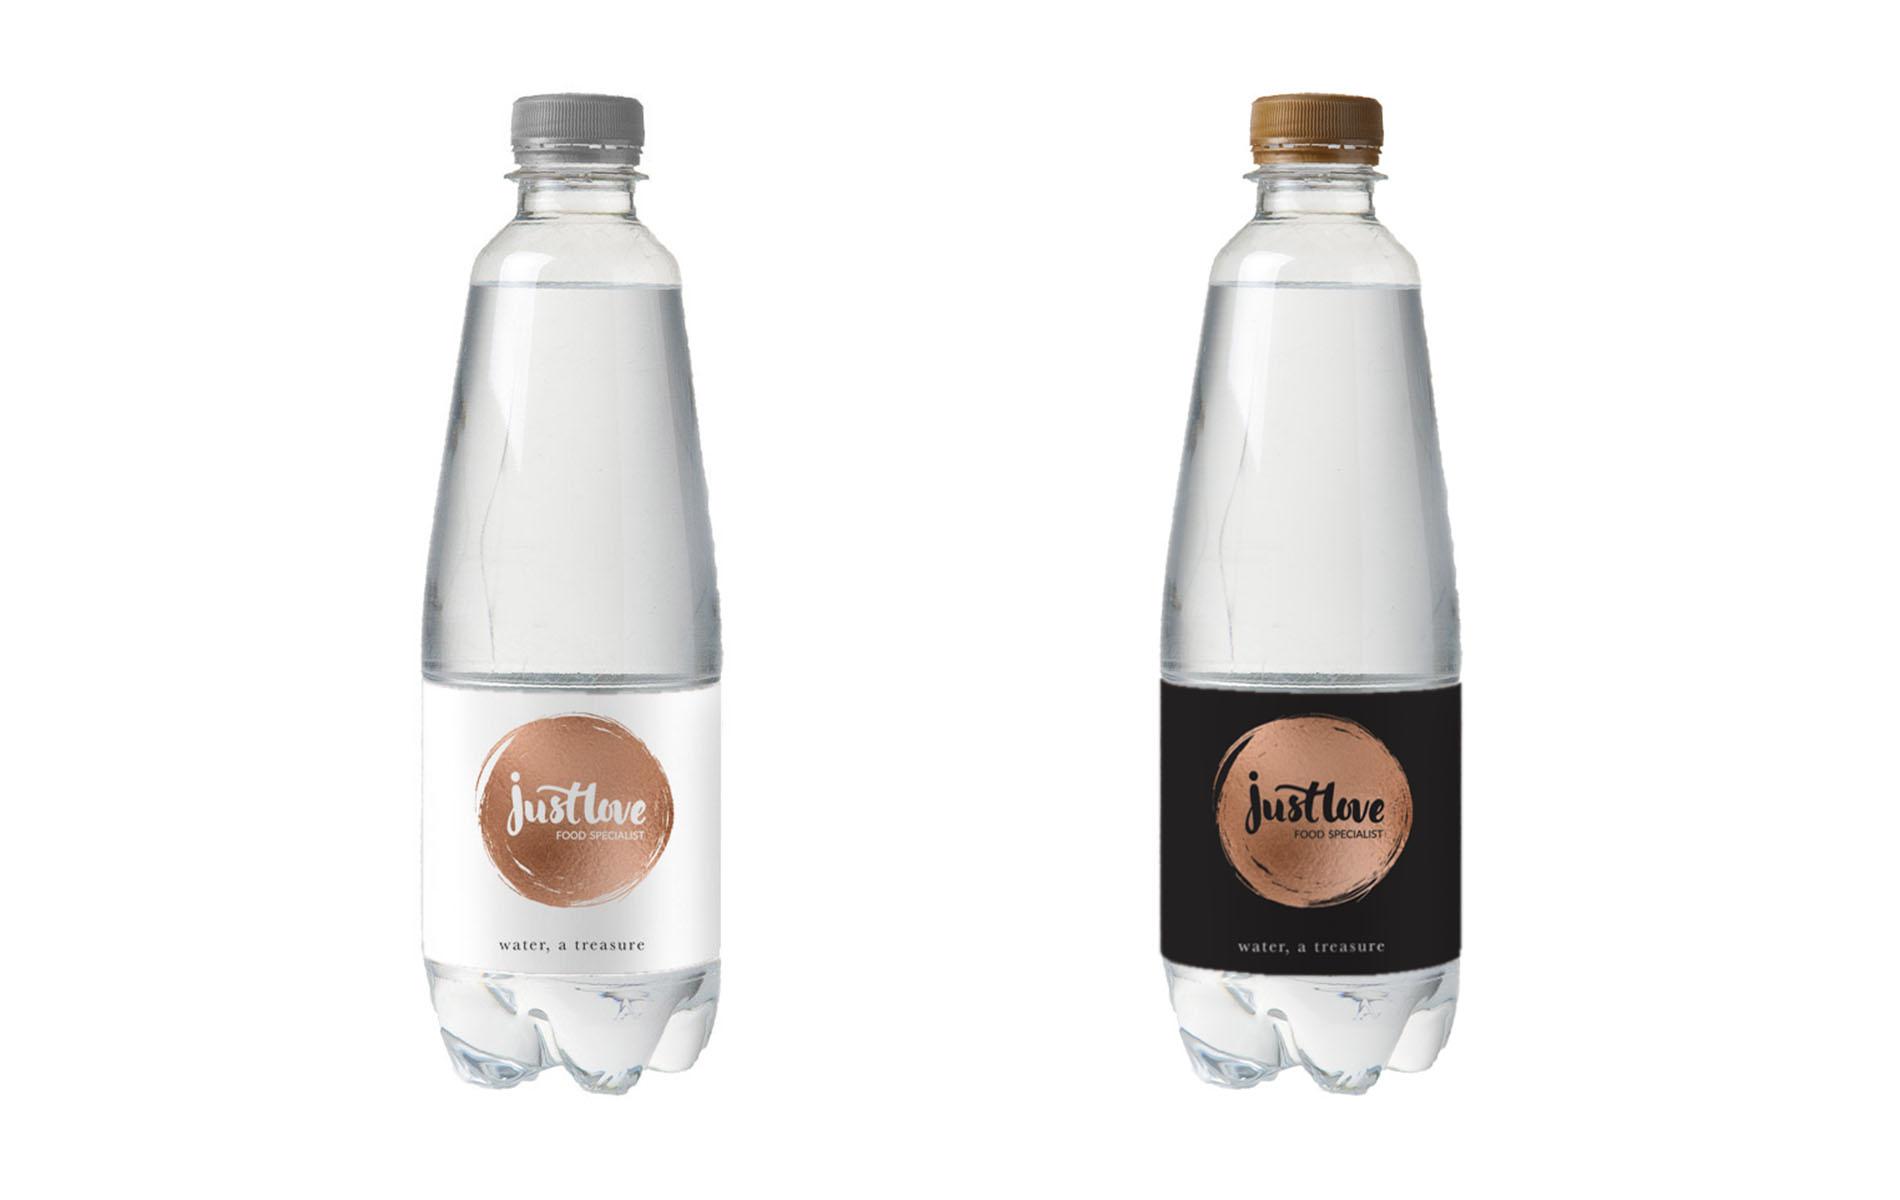 mintlab-brandidentity-justlove-mockup-acqua